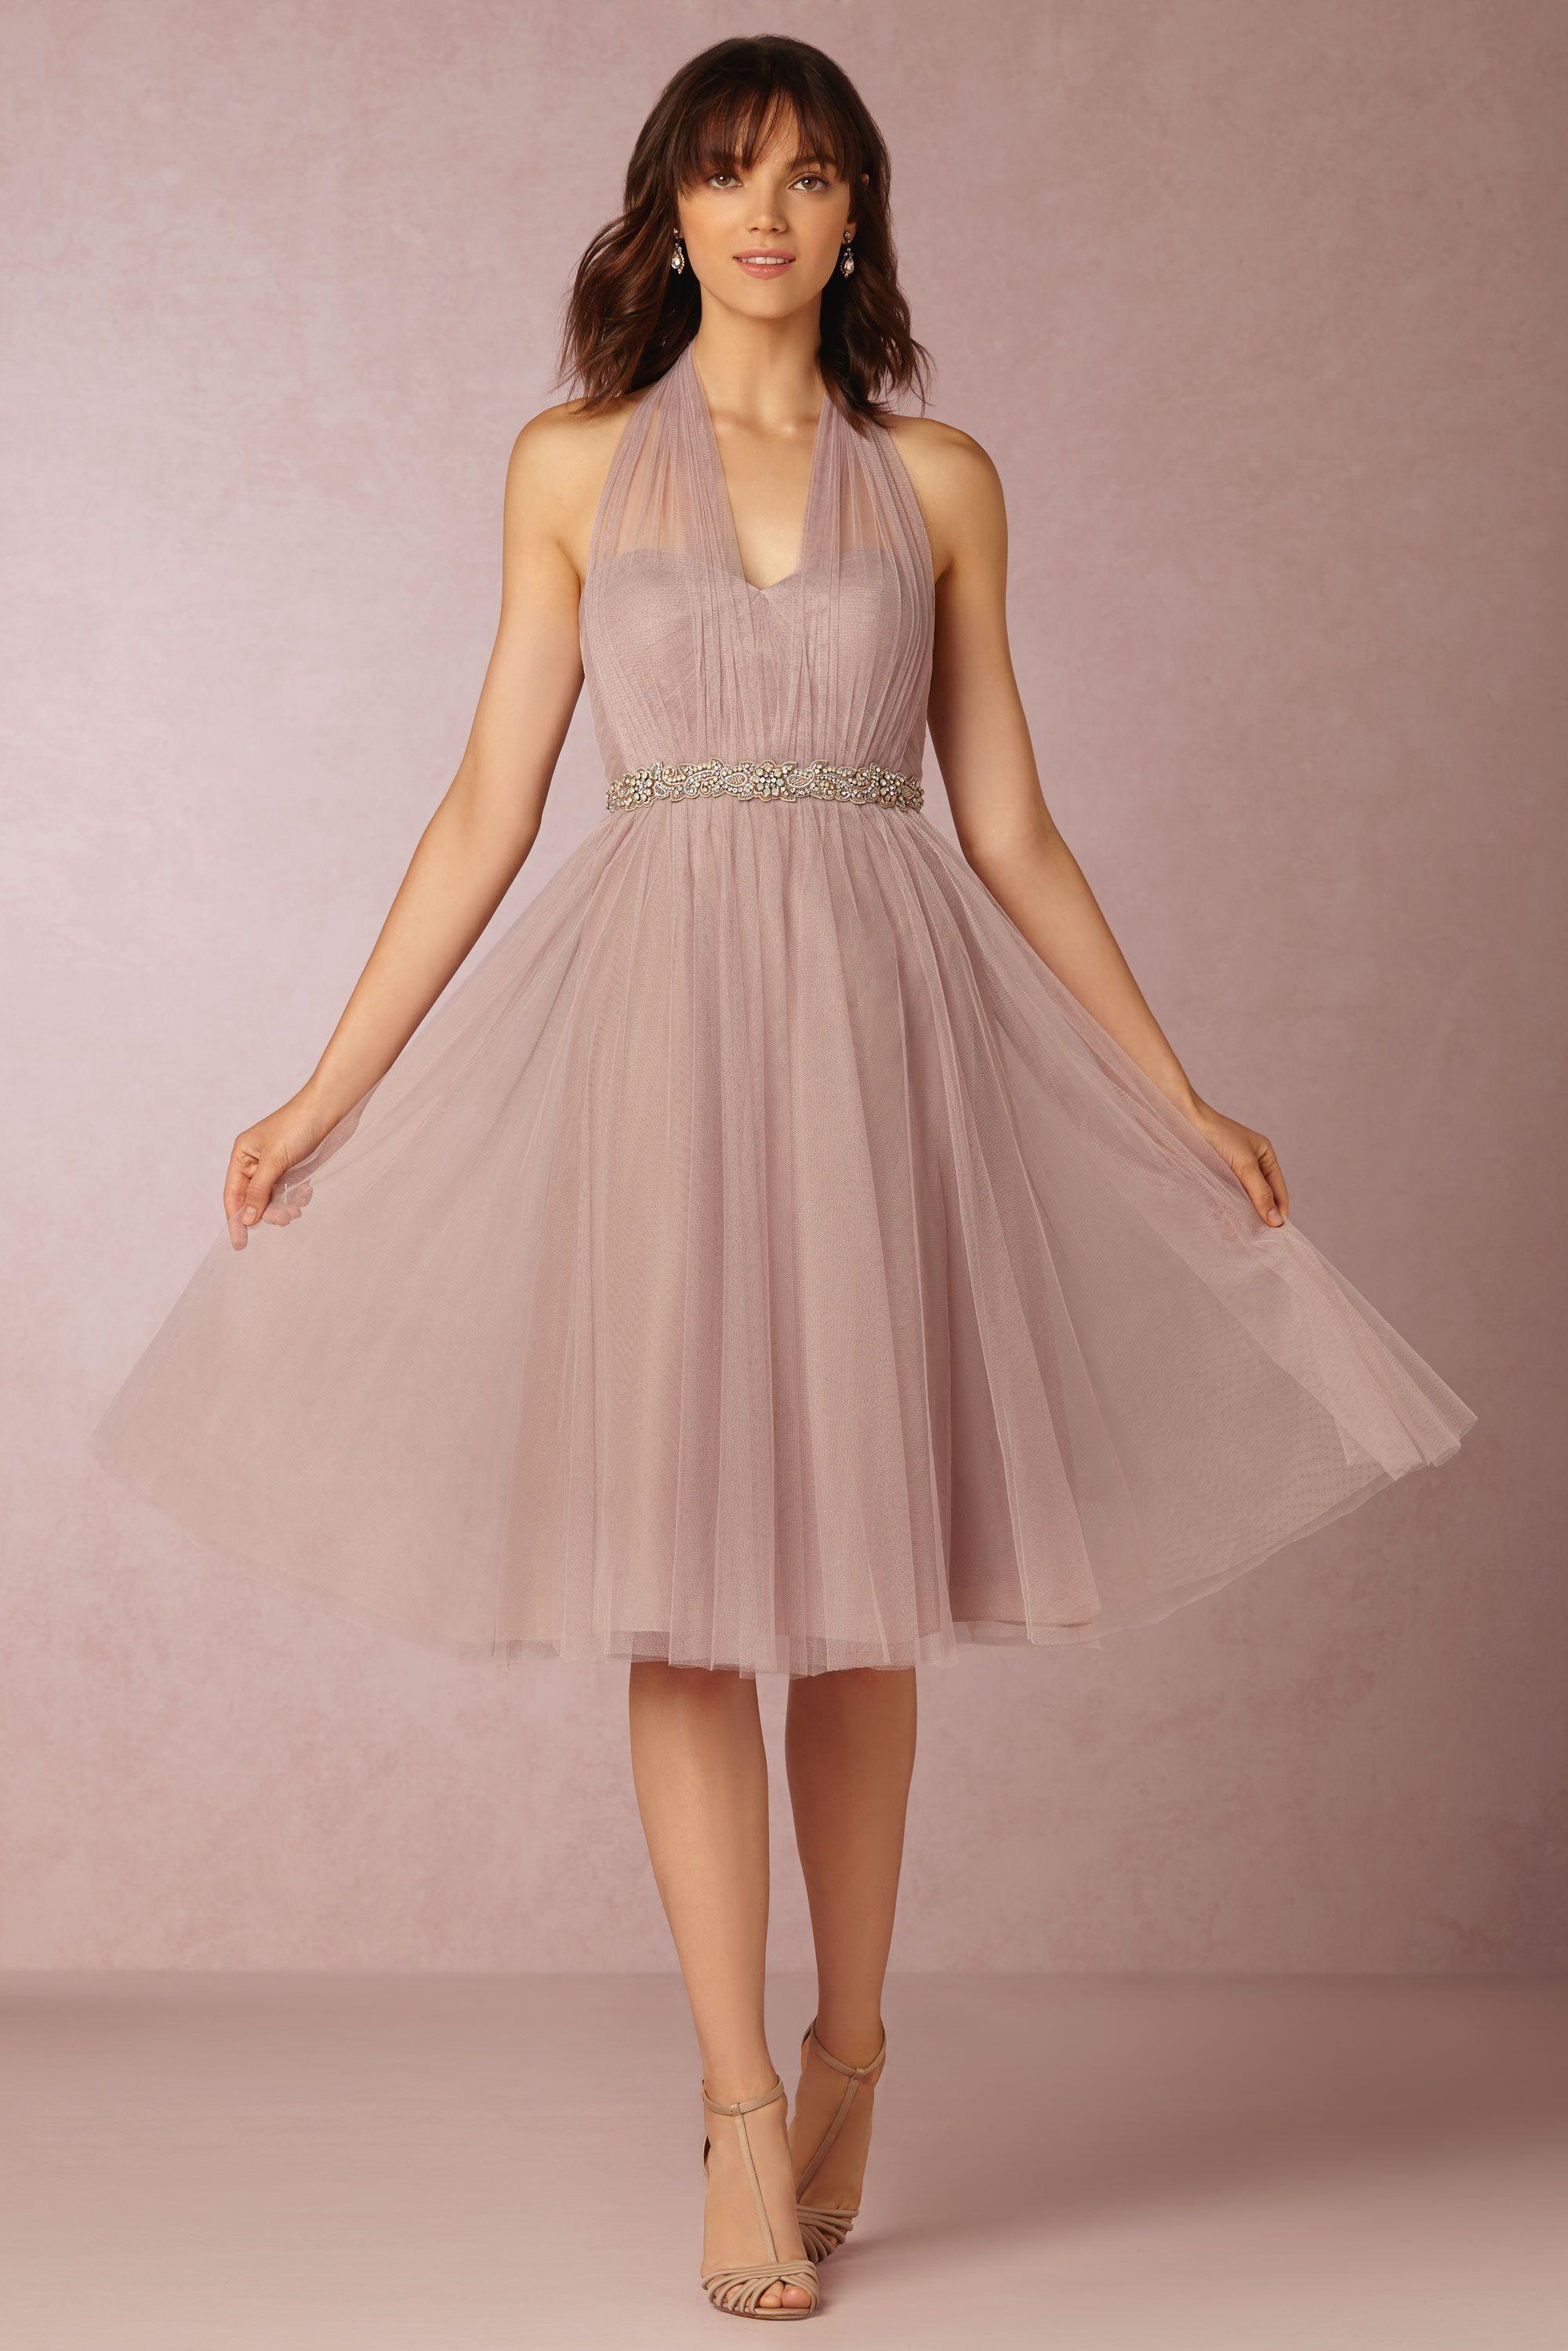 Maia Dress from @BHLDN | Dresses | Pinterest | Damas